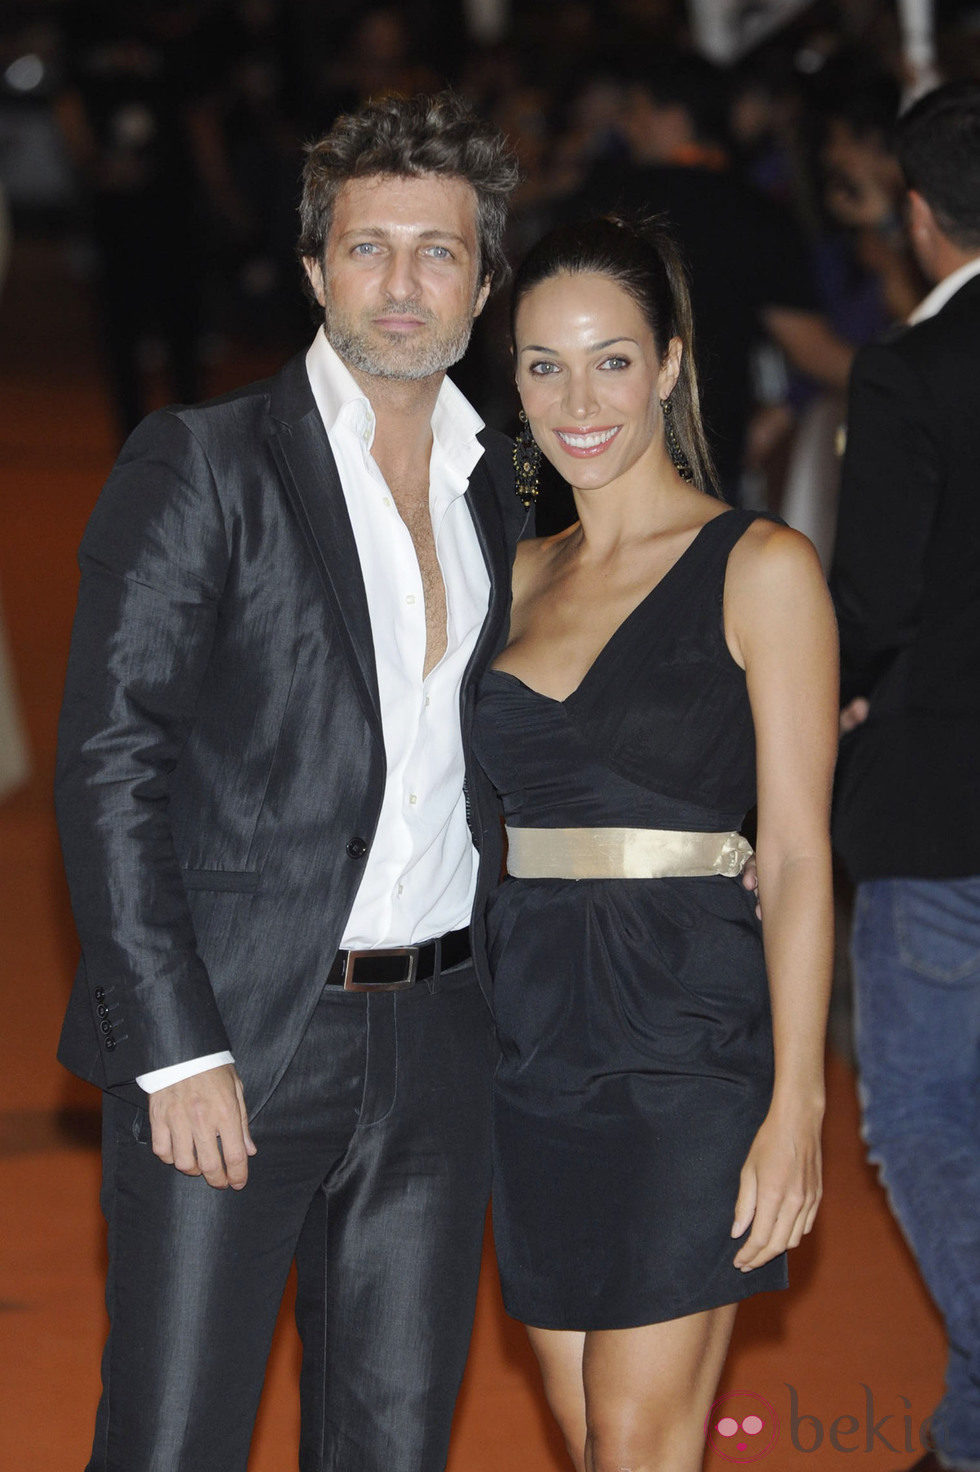 Jesús Olmedo y Nerea Garmendia en la clausura del FesTVal de Vitoria